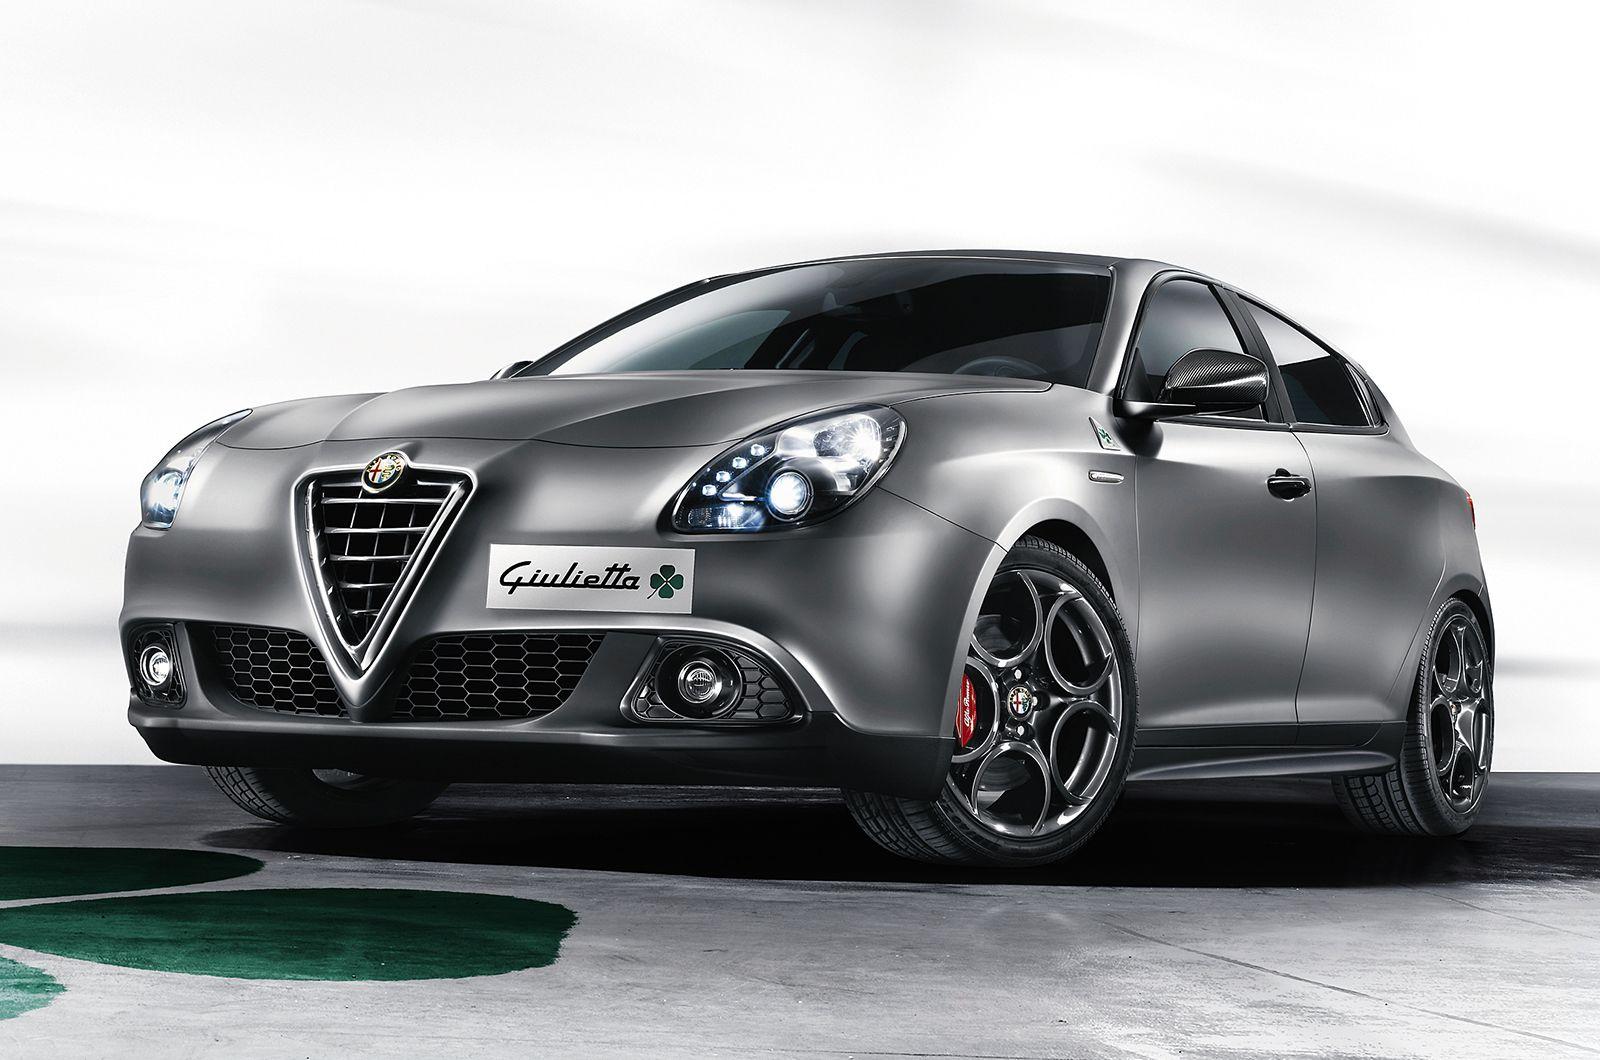 New 237bhp Alfa Romeo Giulietta Quadrifoglio Verde Revealed Www